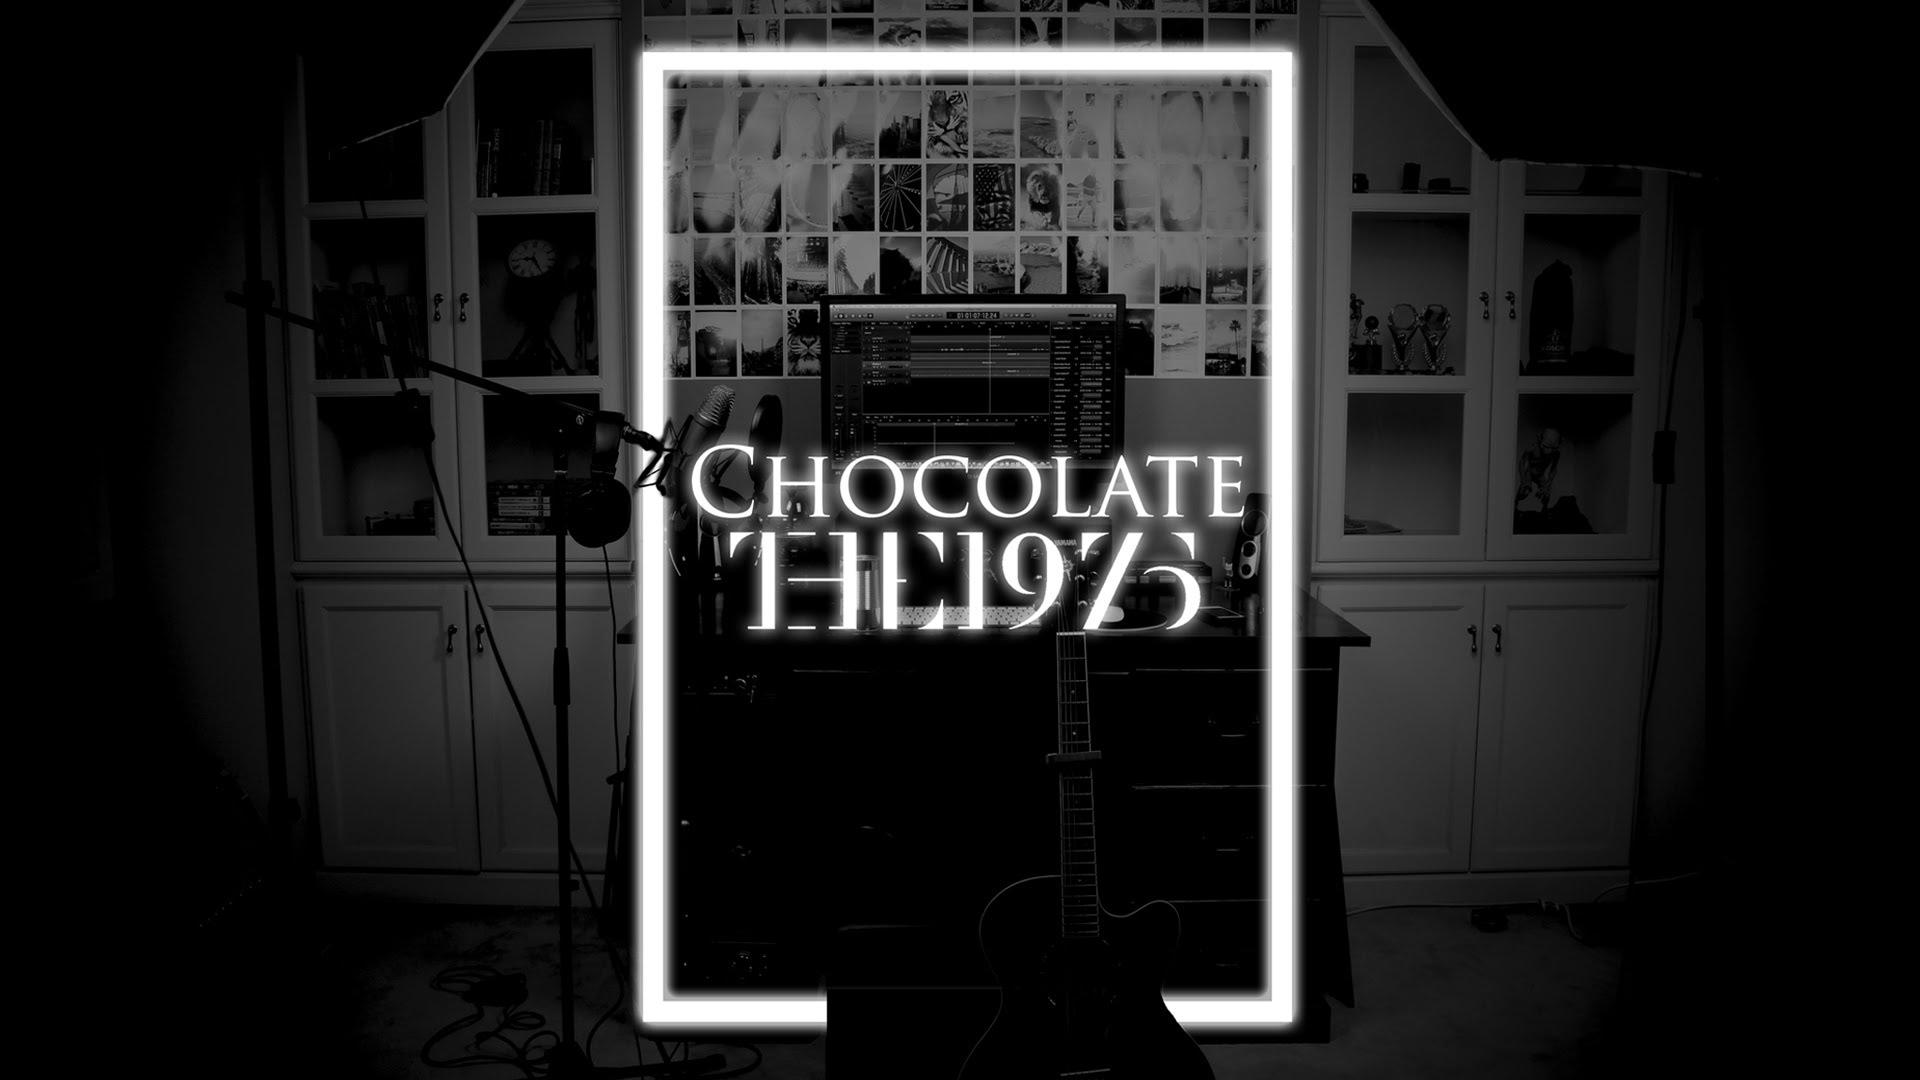 The 1975 Chocolate Album Cover   www.imgkid.com - The ...